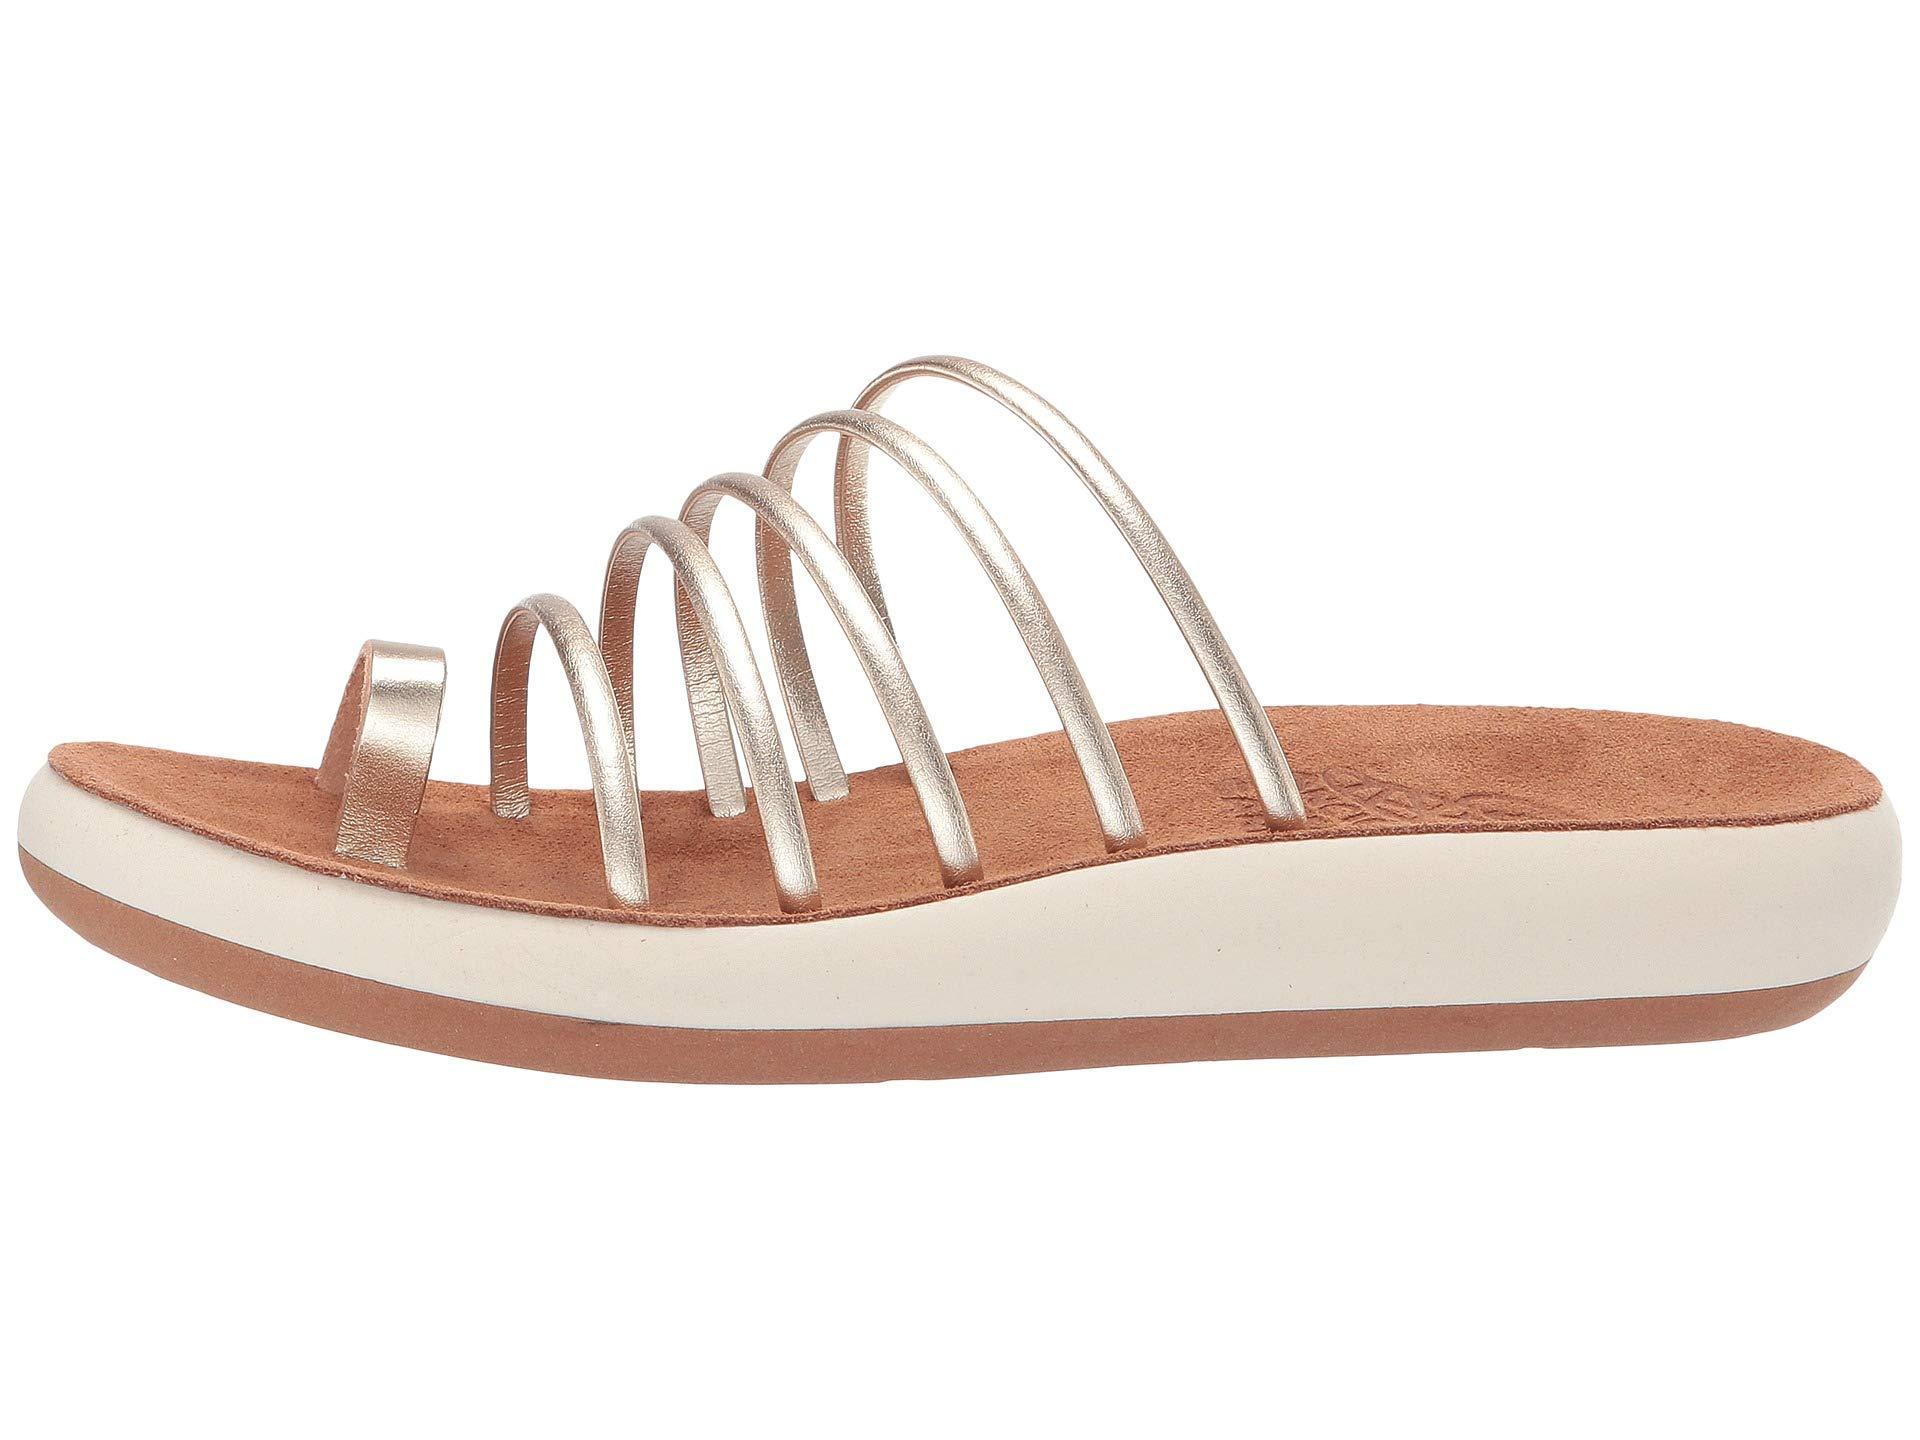 Sandals Greek Hypatia Ancient Comfort Platinum zPnx0ax